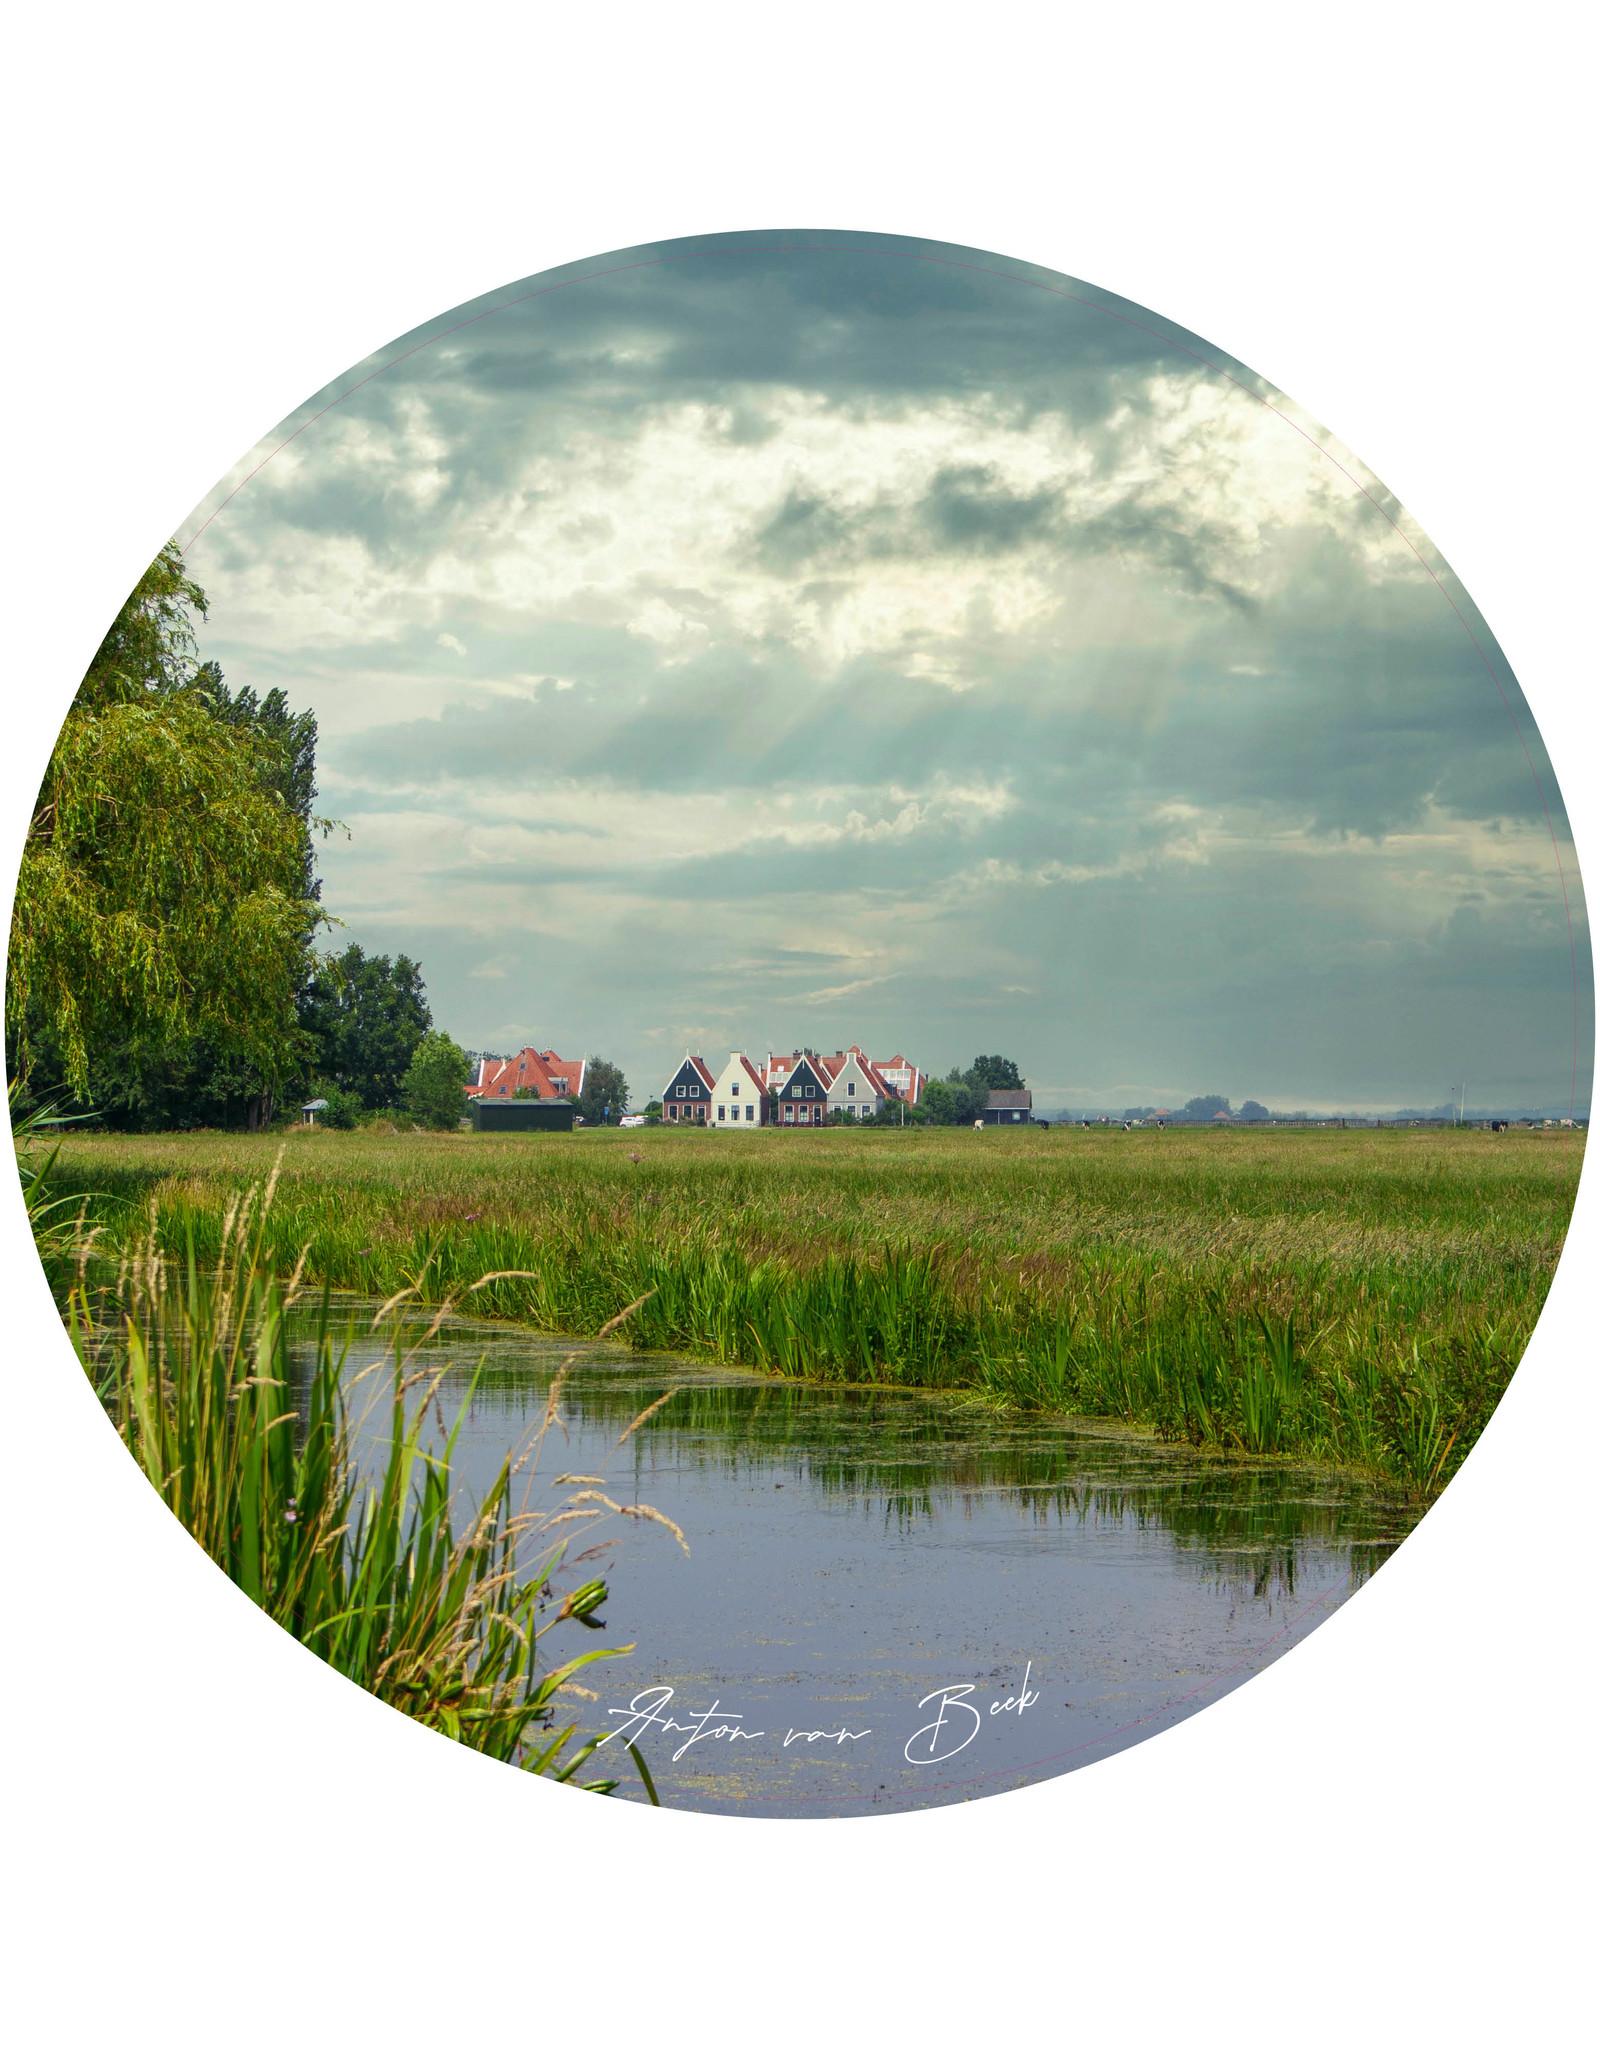 Dunnebier Home Muursticker Noord Holland - verwijderbaar